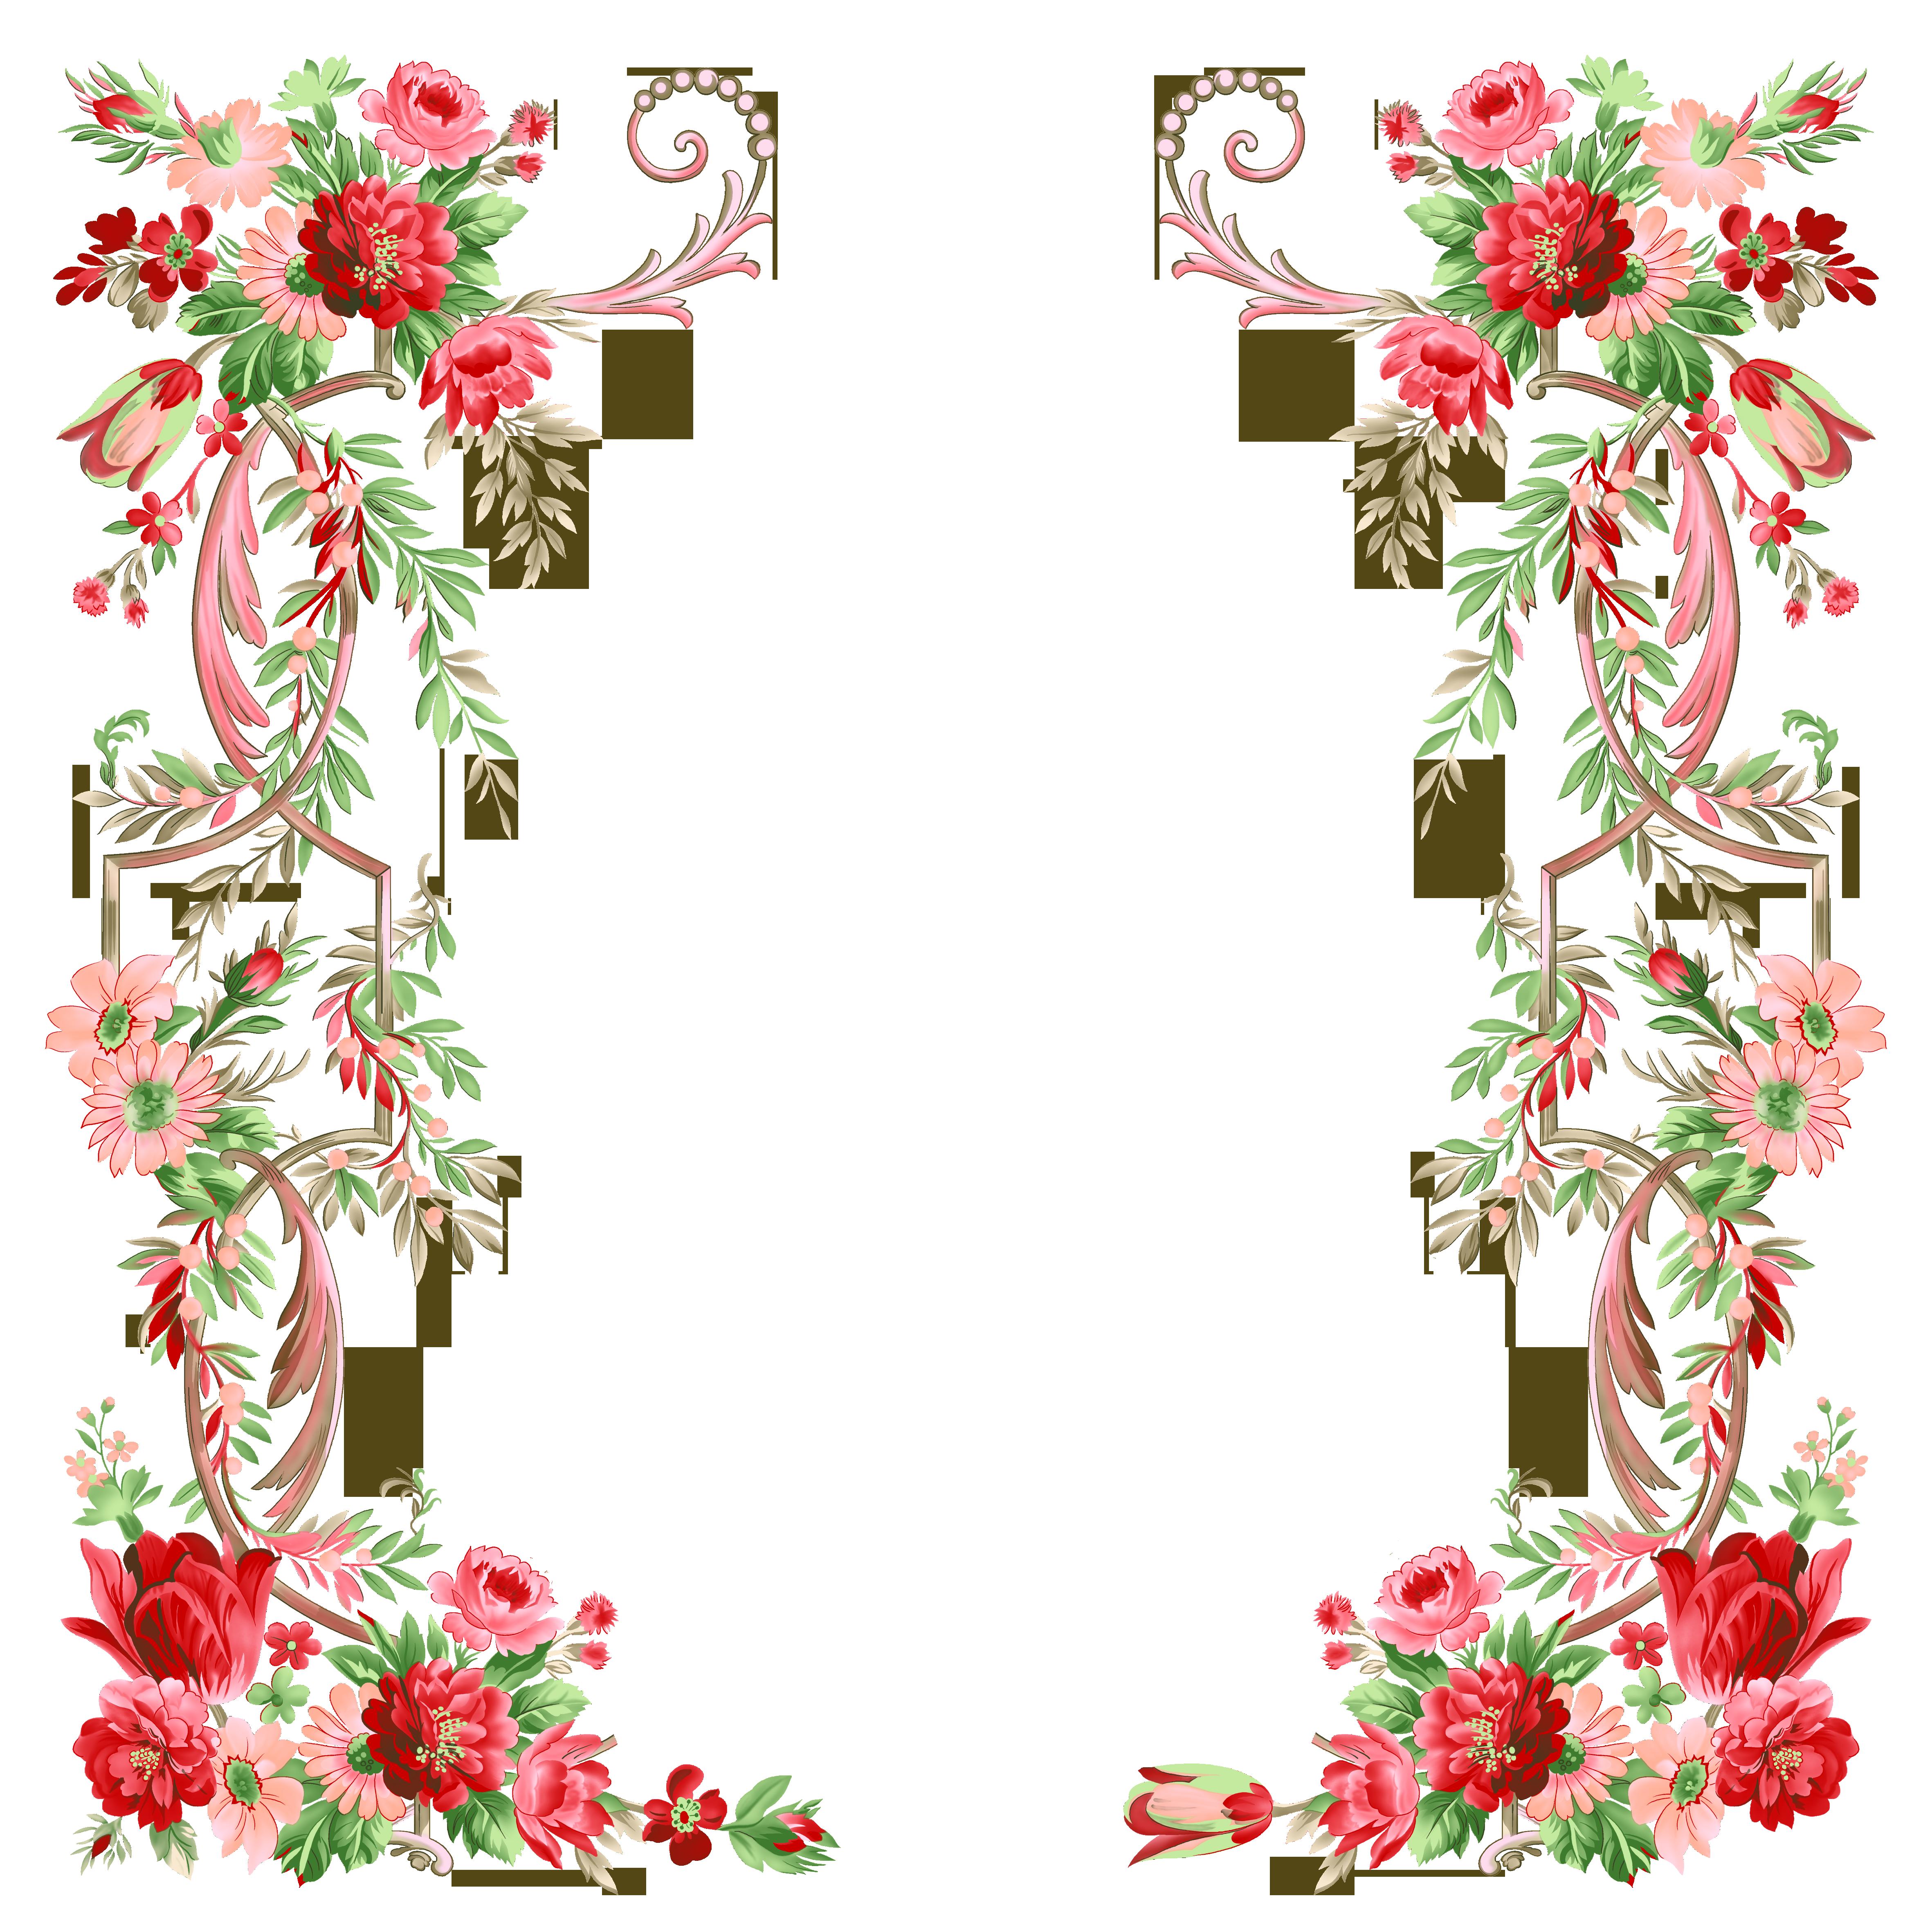 рамки для фото цветы: